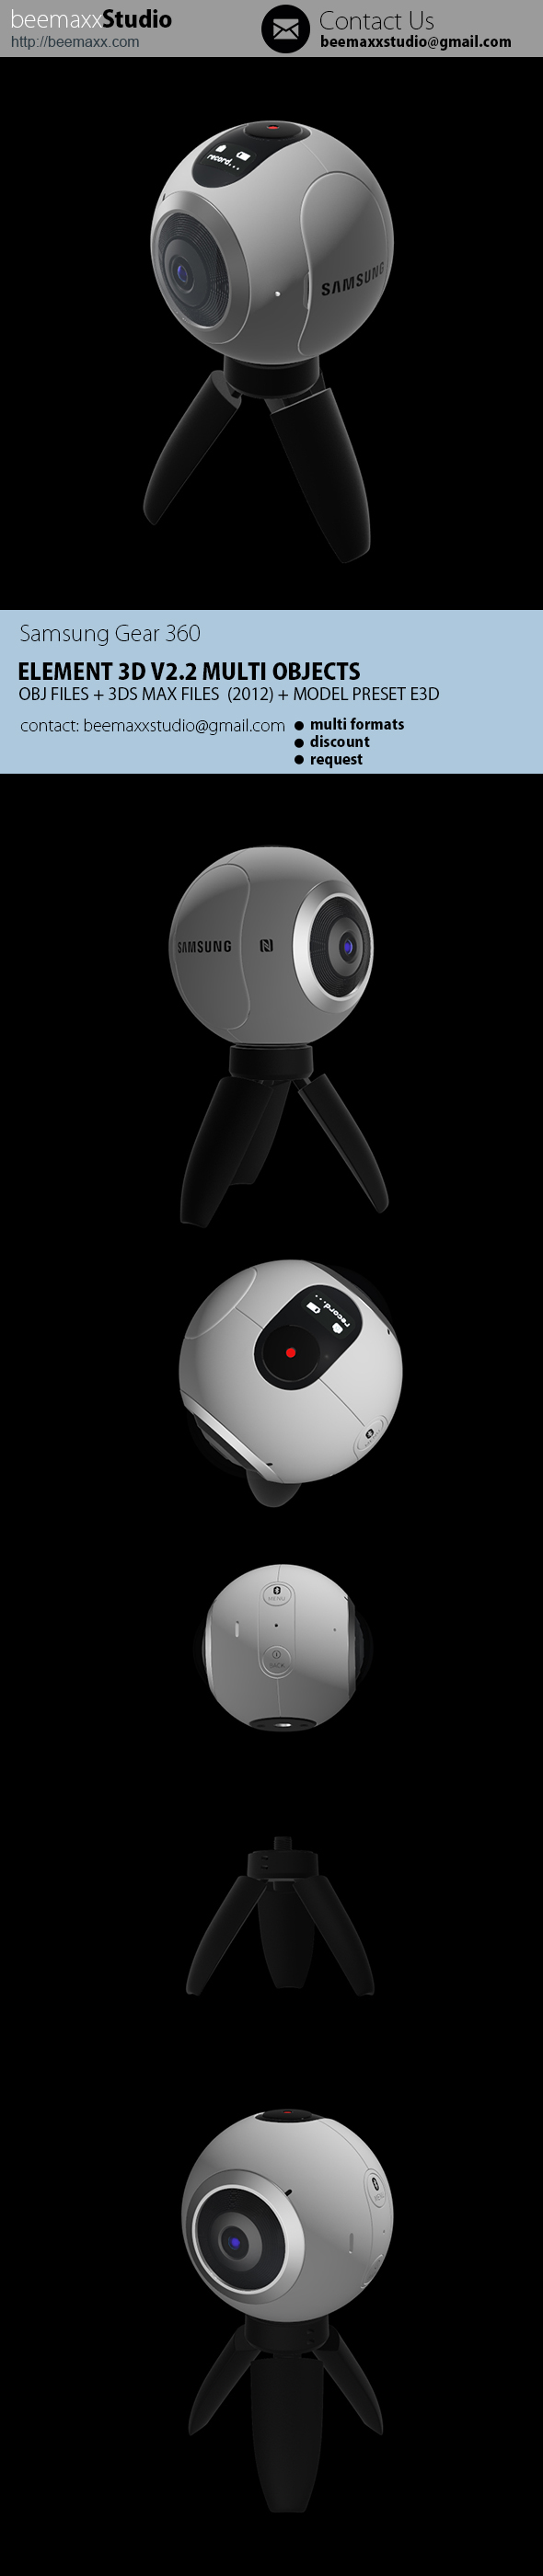 E3D - Samsung Gear 360 Camera - 3DOcean Item for Sale